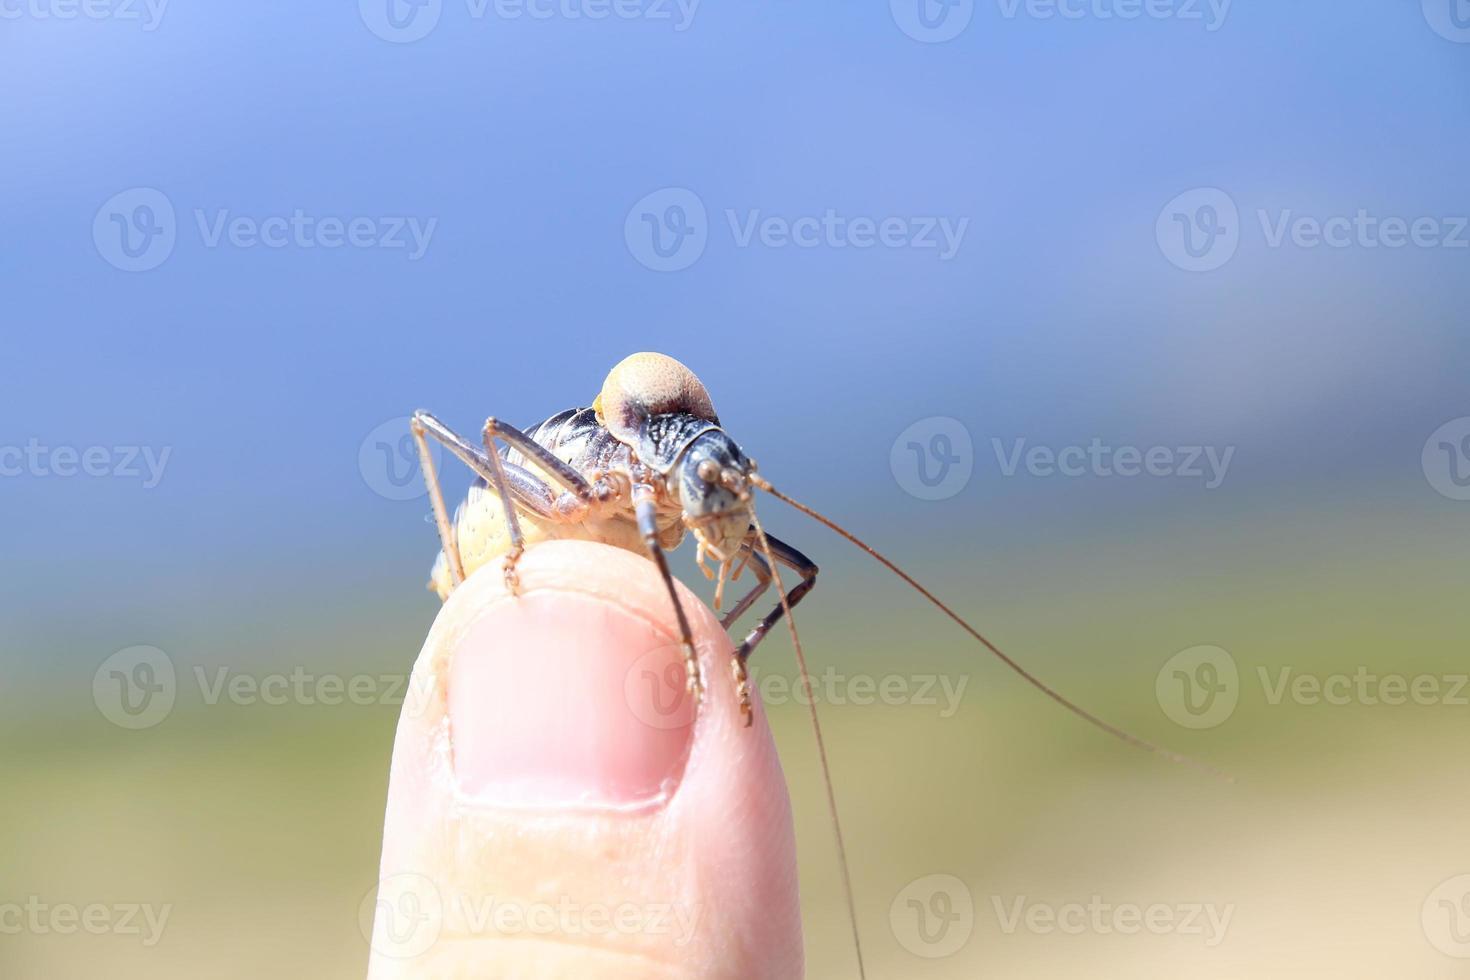 cricket arbusto, típico de la sierra de madrid foto